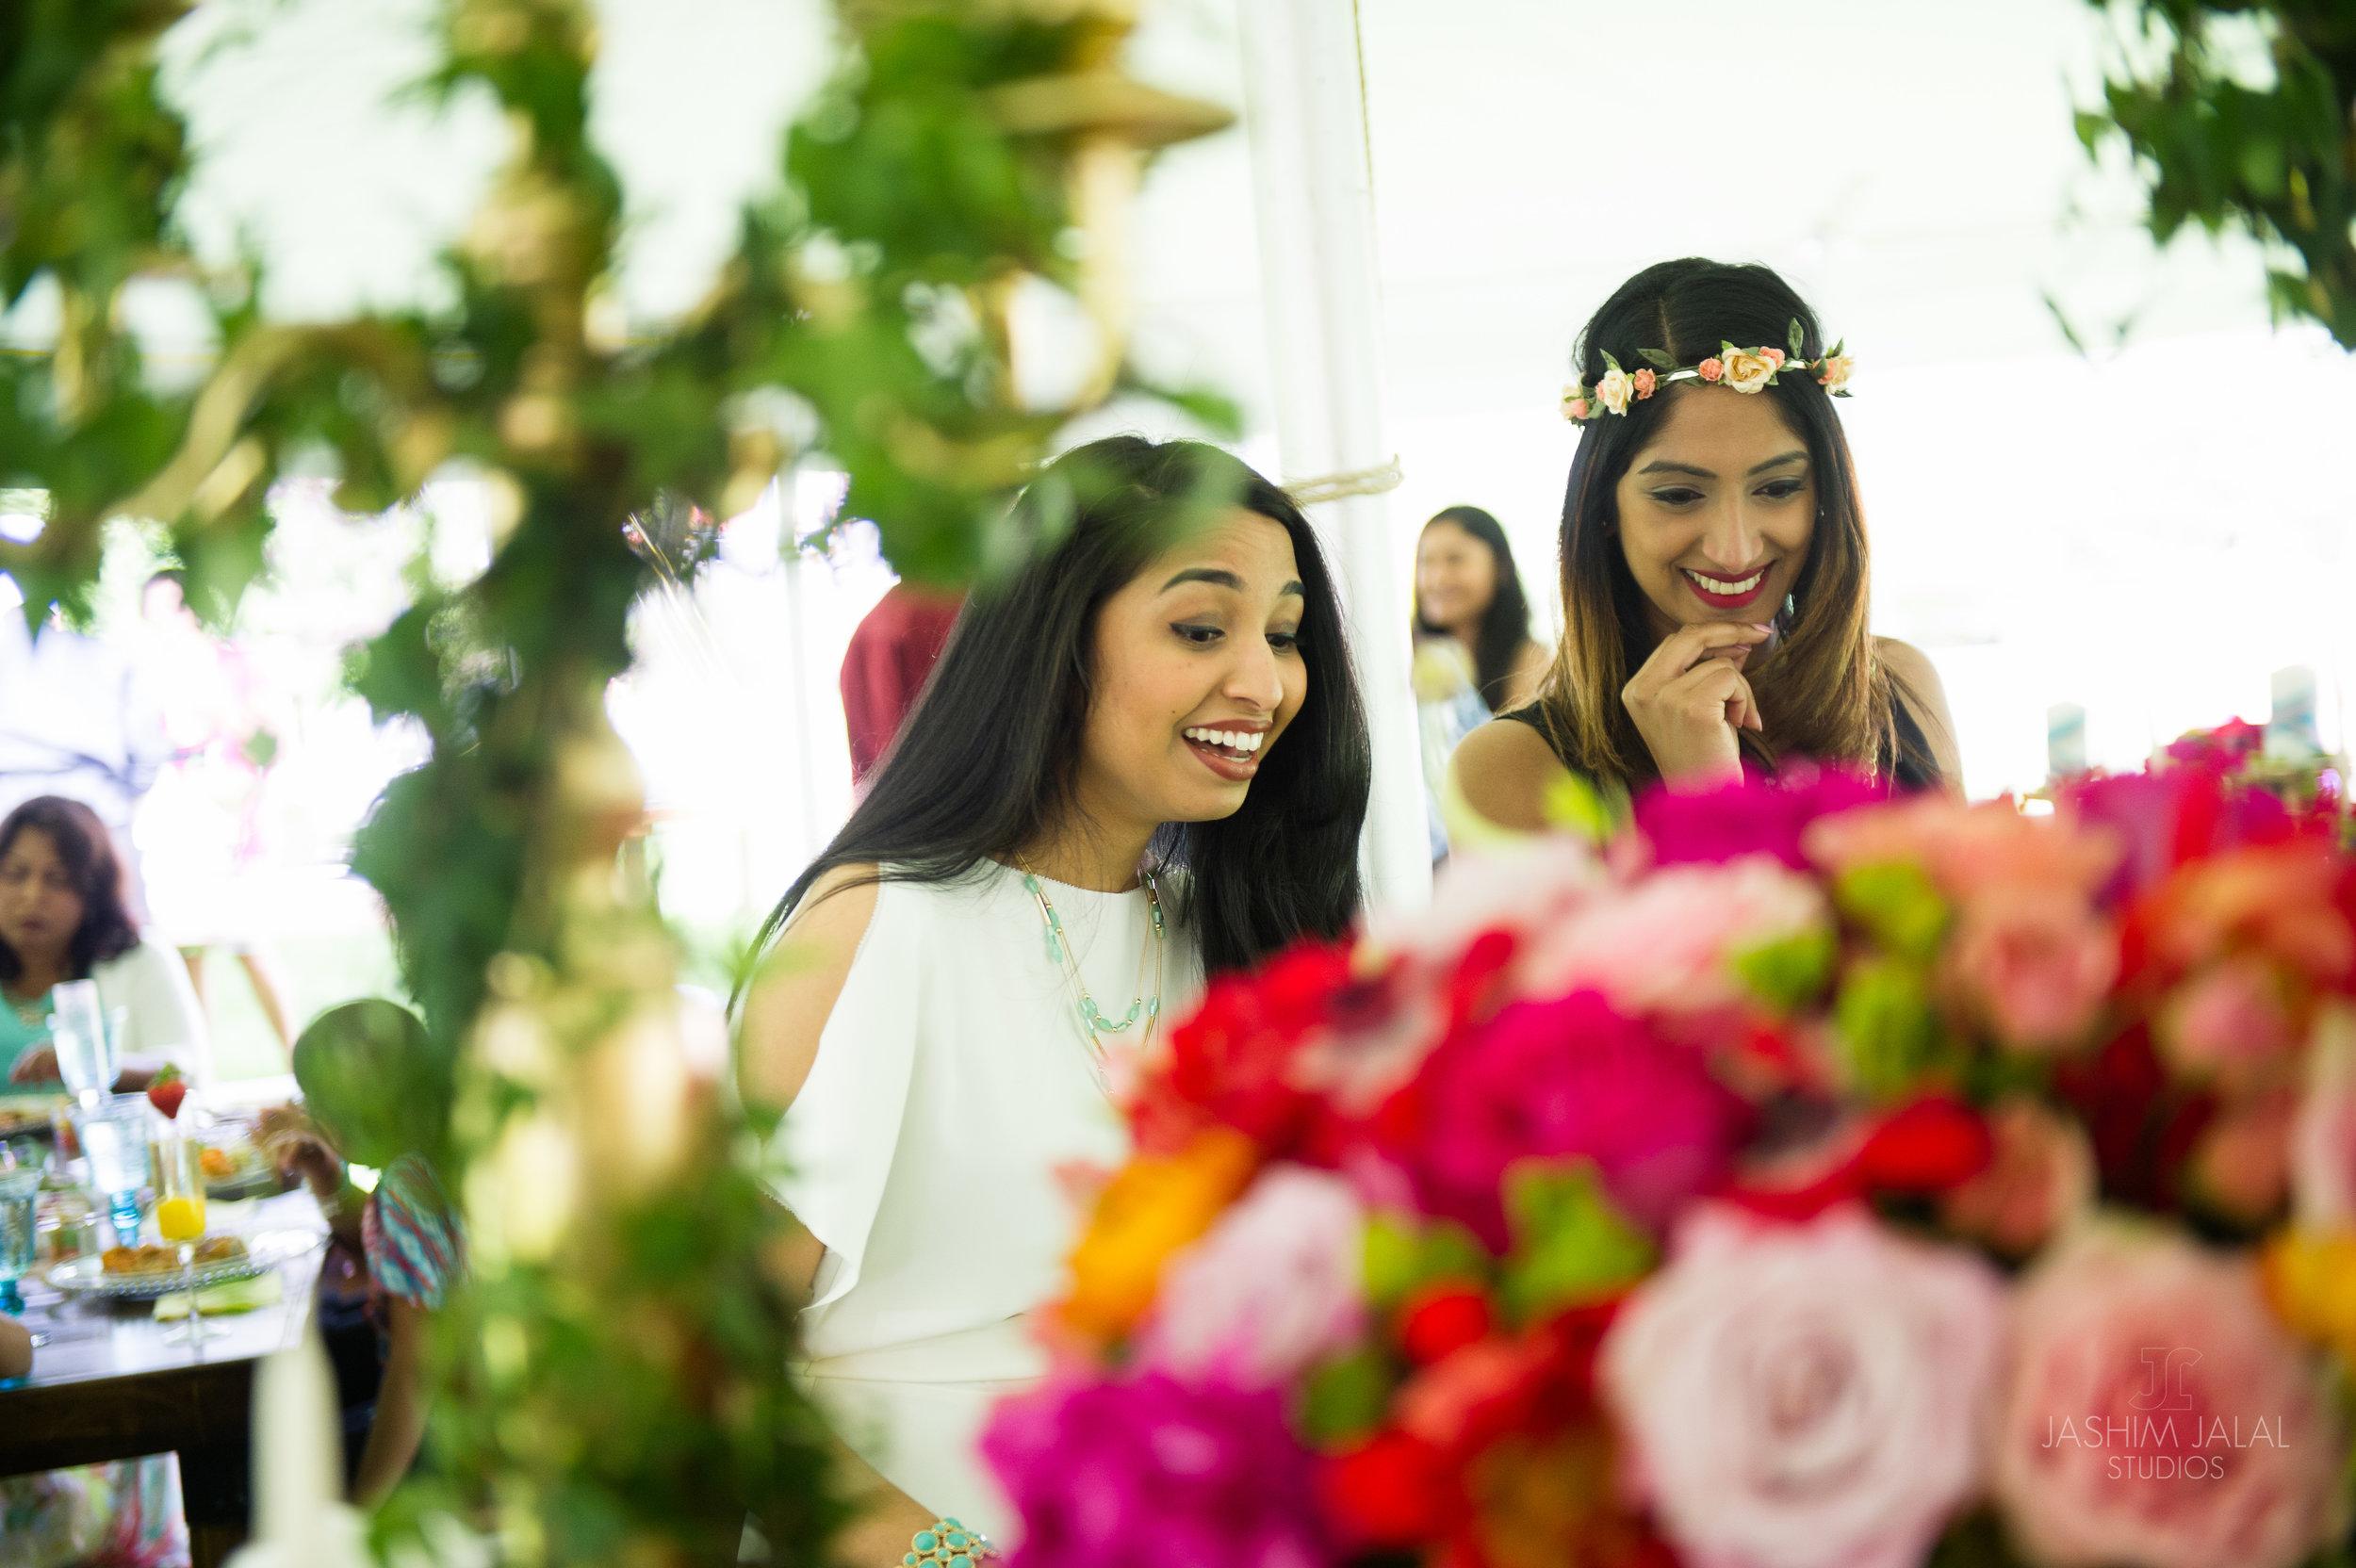 Indian Bridal Shower Boho Chic Summer Tent Event with Dancer (2).JPG